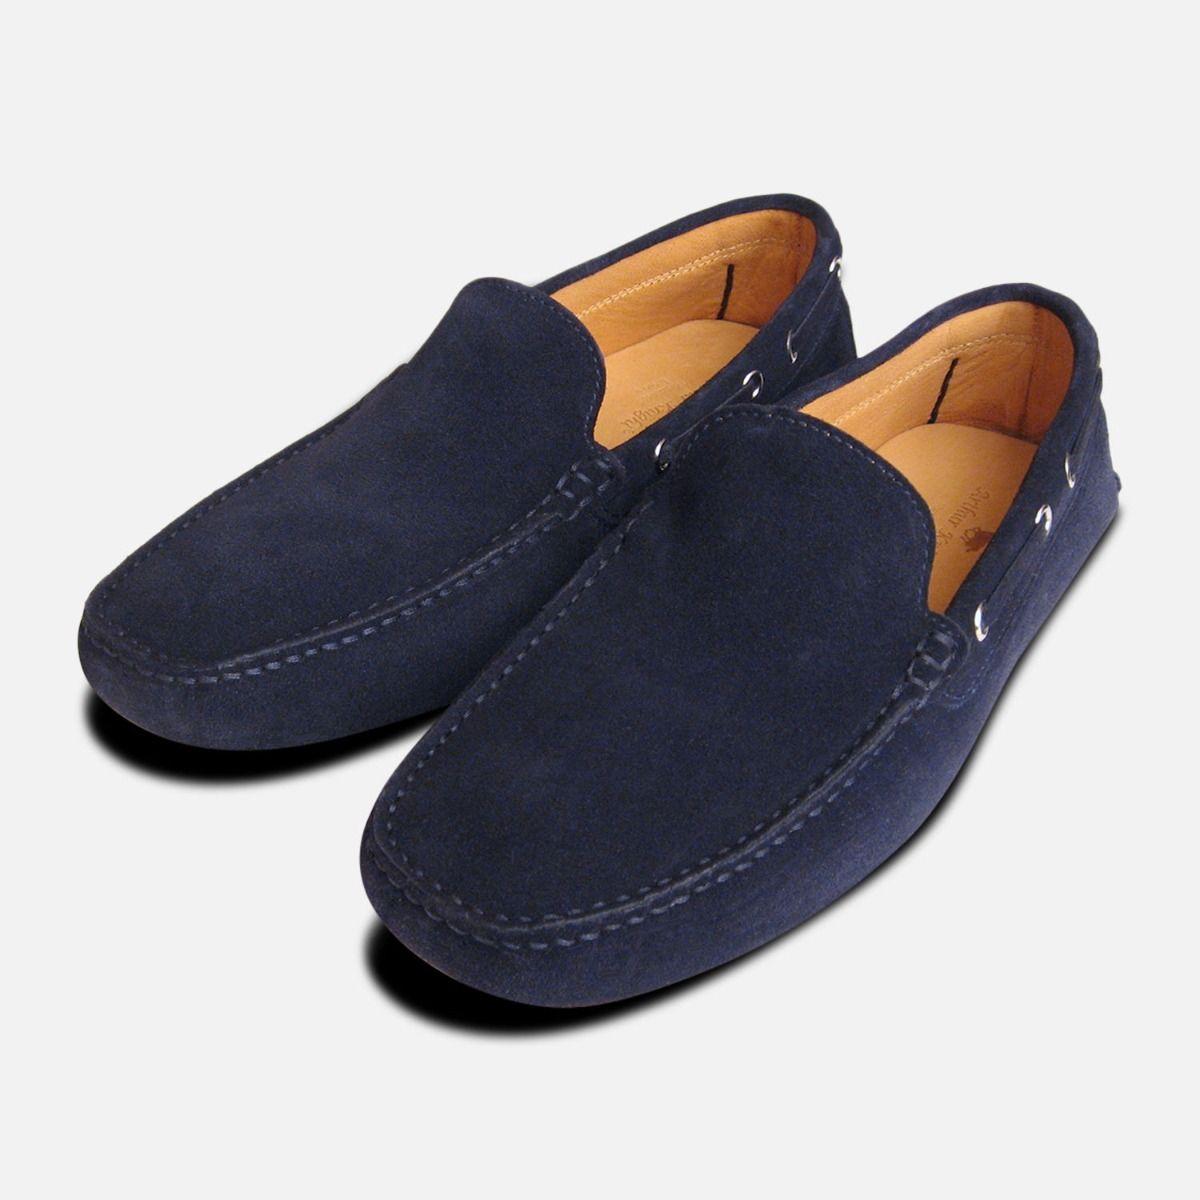 Navy Blue Suede Italian Driving Shoe